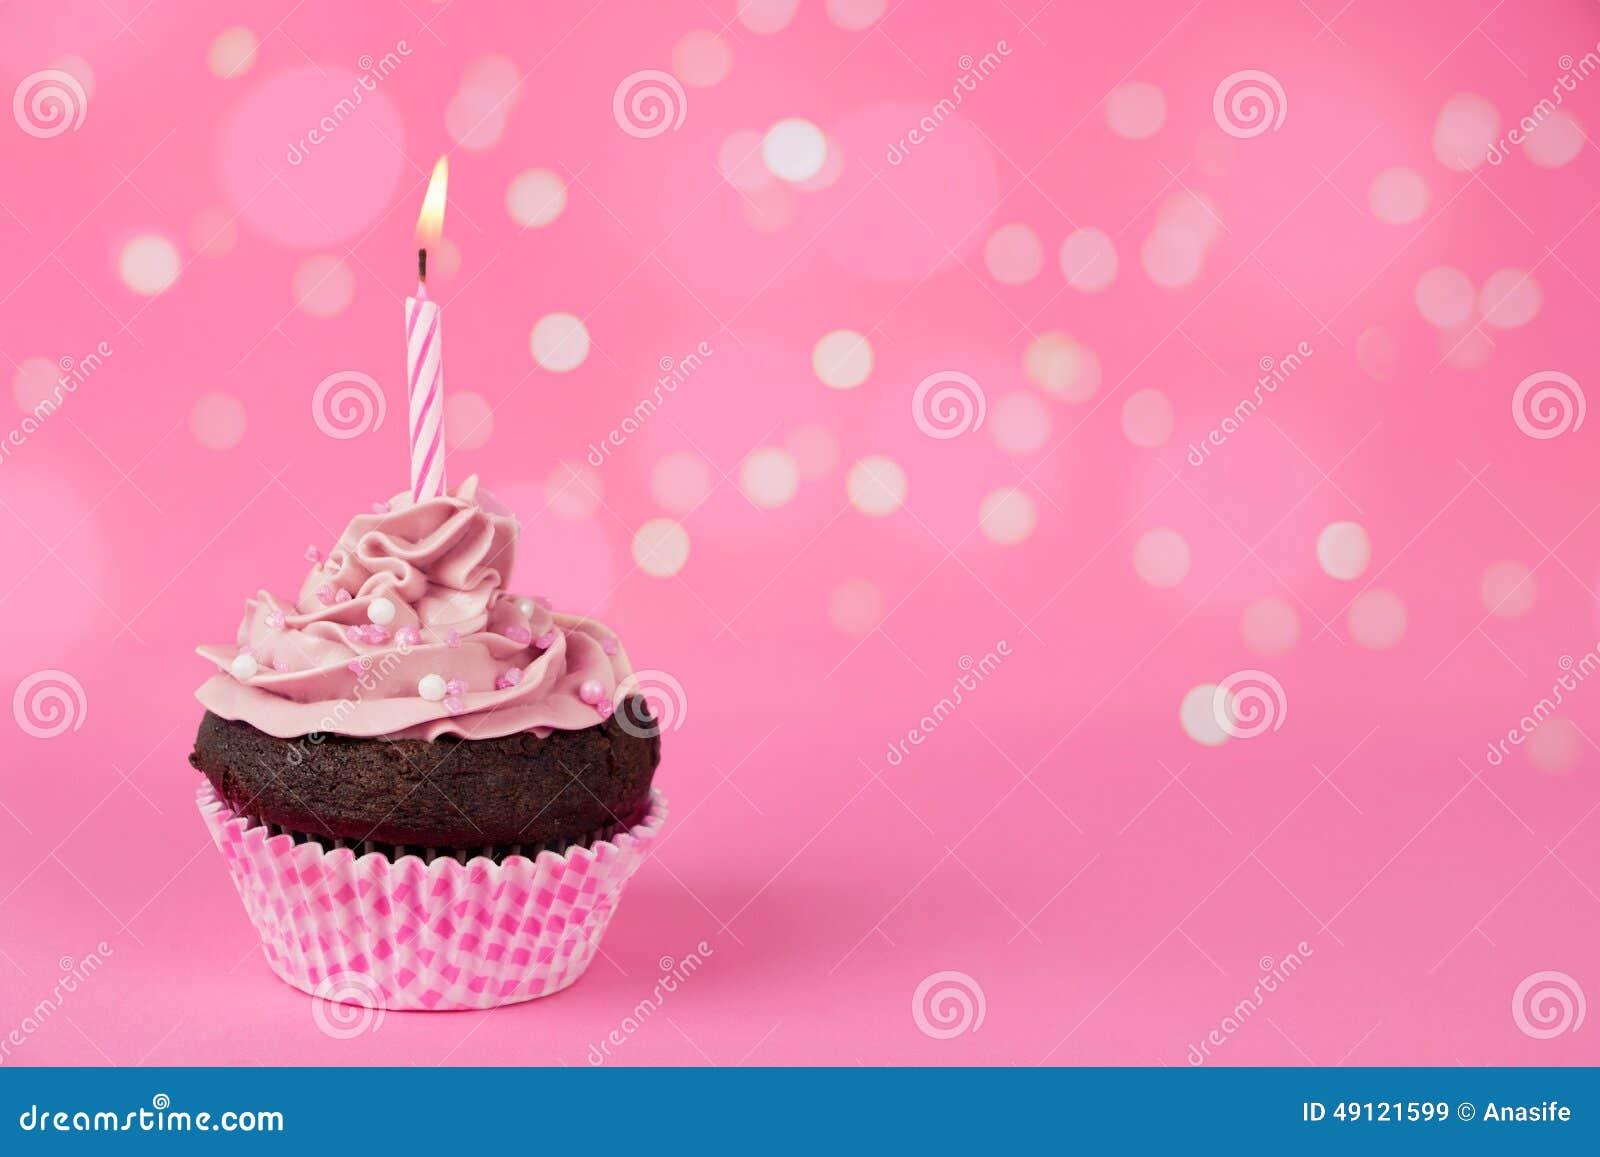 Pink Birthday Cupcake With Lights Stock Image Image